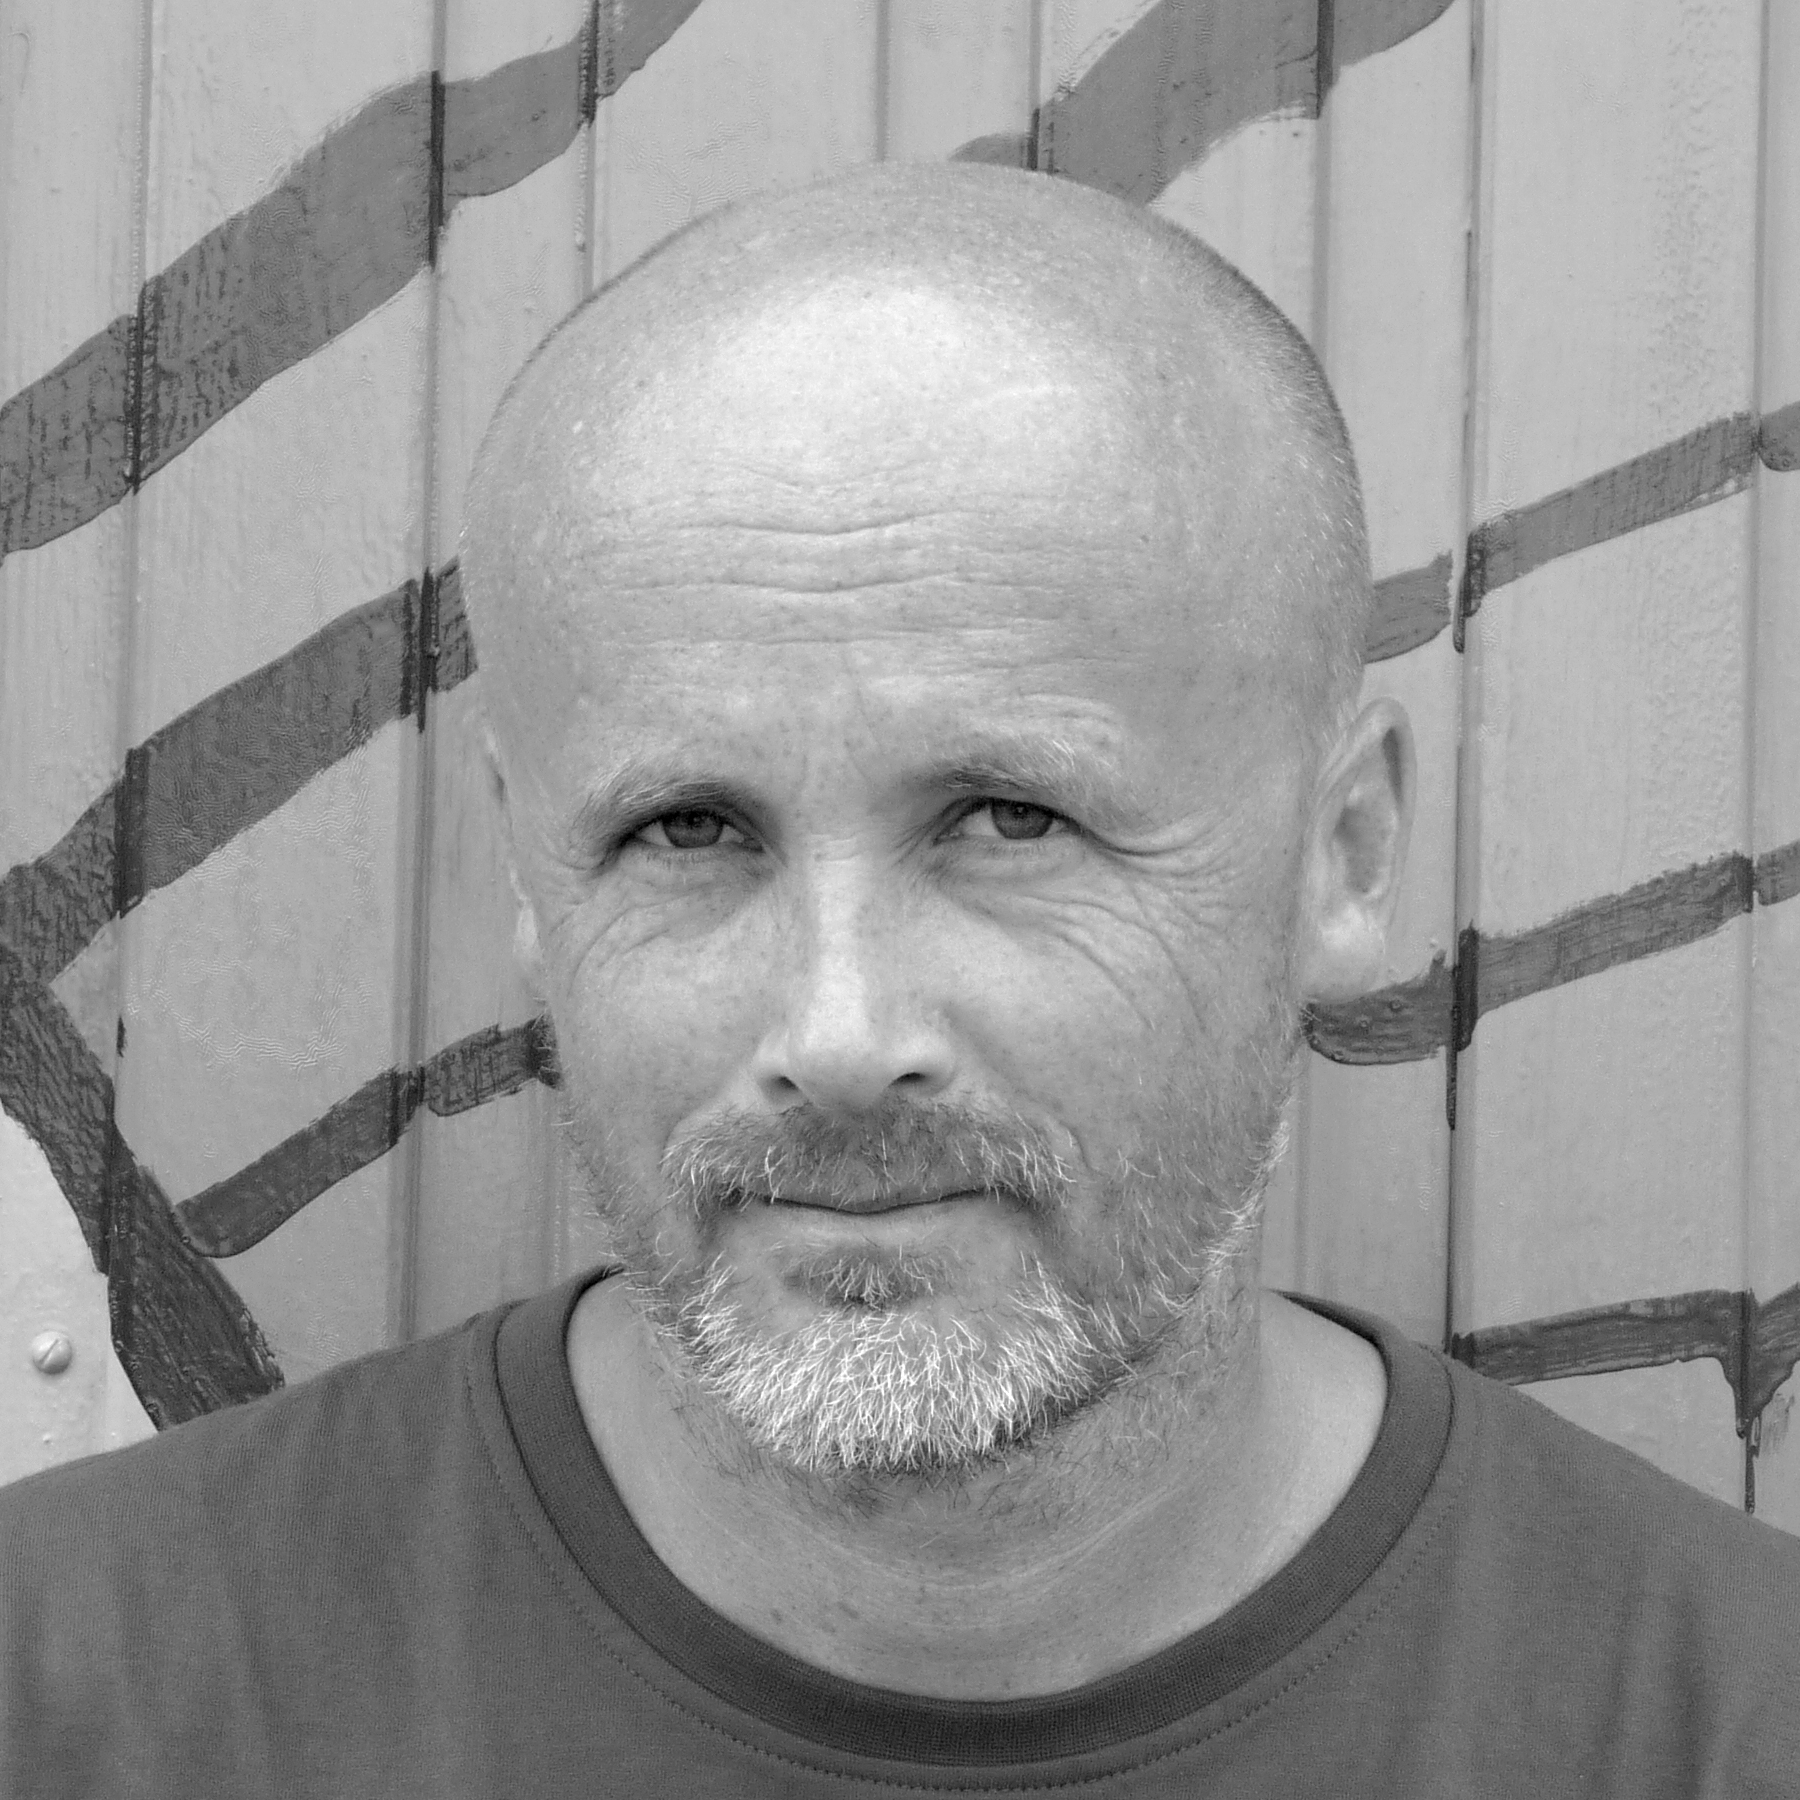 Jan Padrnos